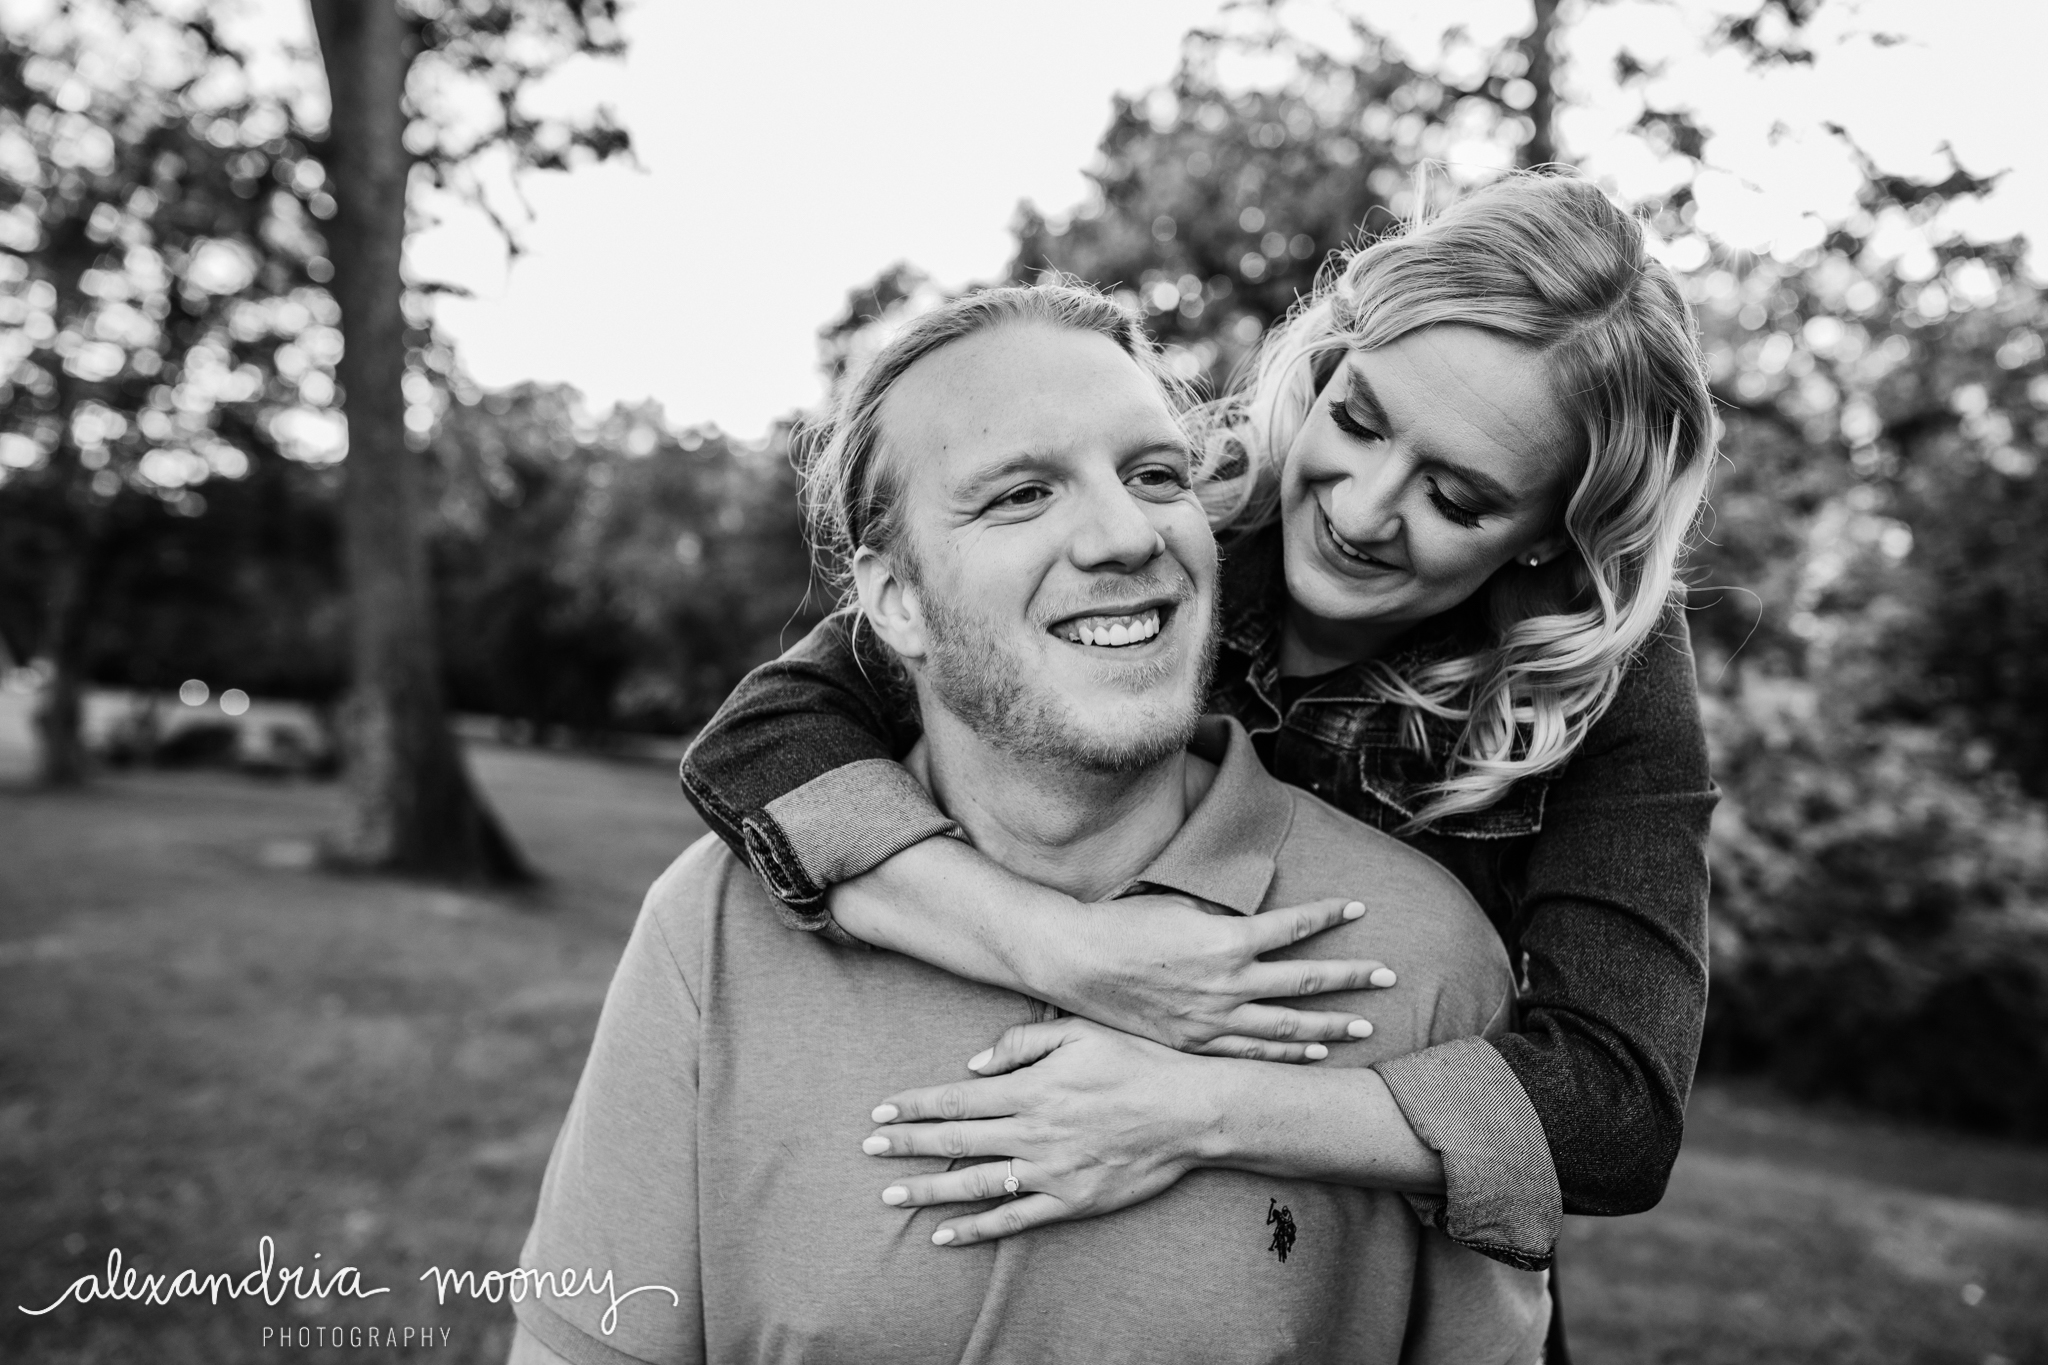 Tina_and_Jake_WATERMARKED-3.jpg